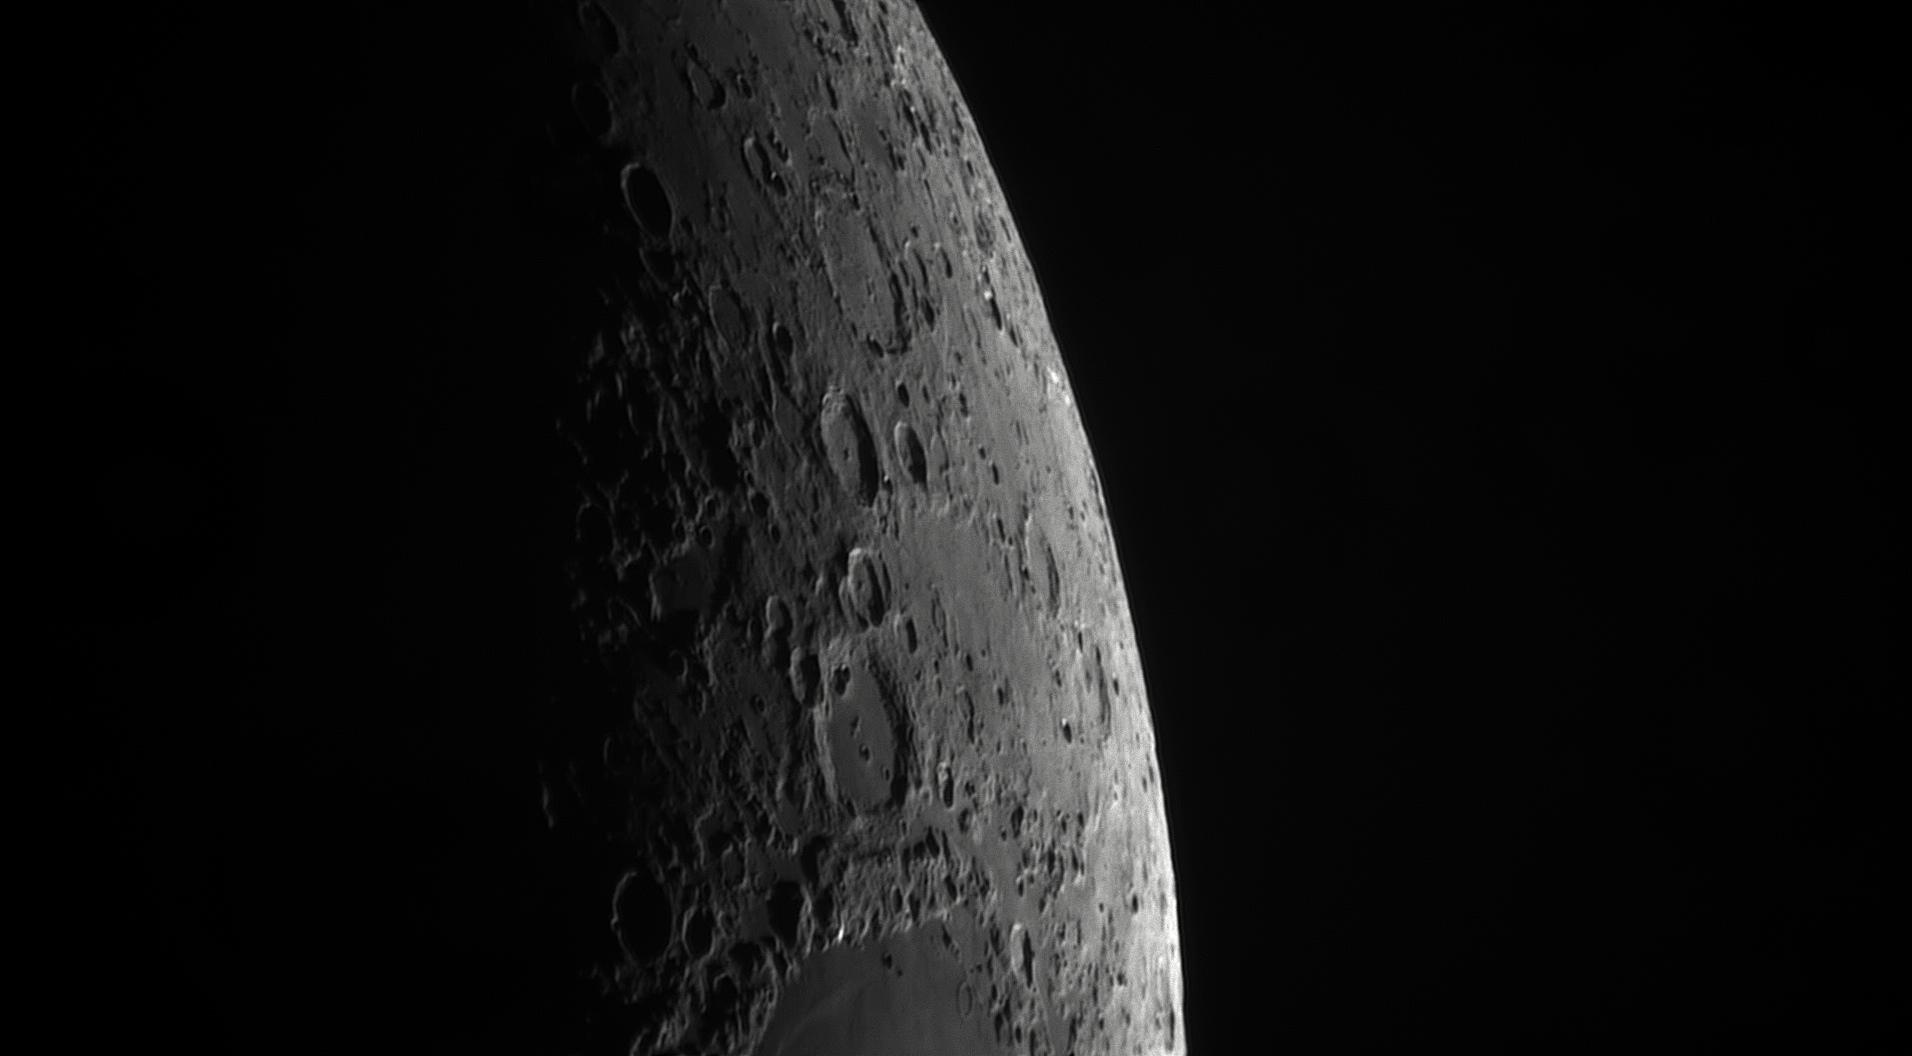 5cf9d0eb9b97c_Moon_205041_060619_ZWOASI290MM_IR_680nm_AS_P35_lapl4_ap103.jpg.61115e84b0eca2dbf7c5c7c5e1cc5832.jpg